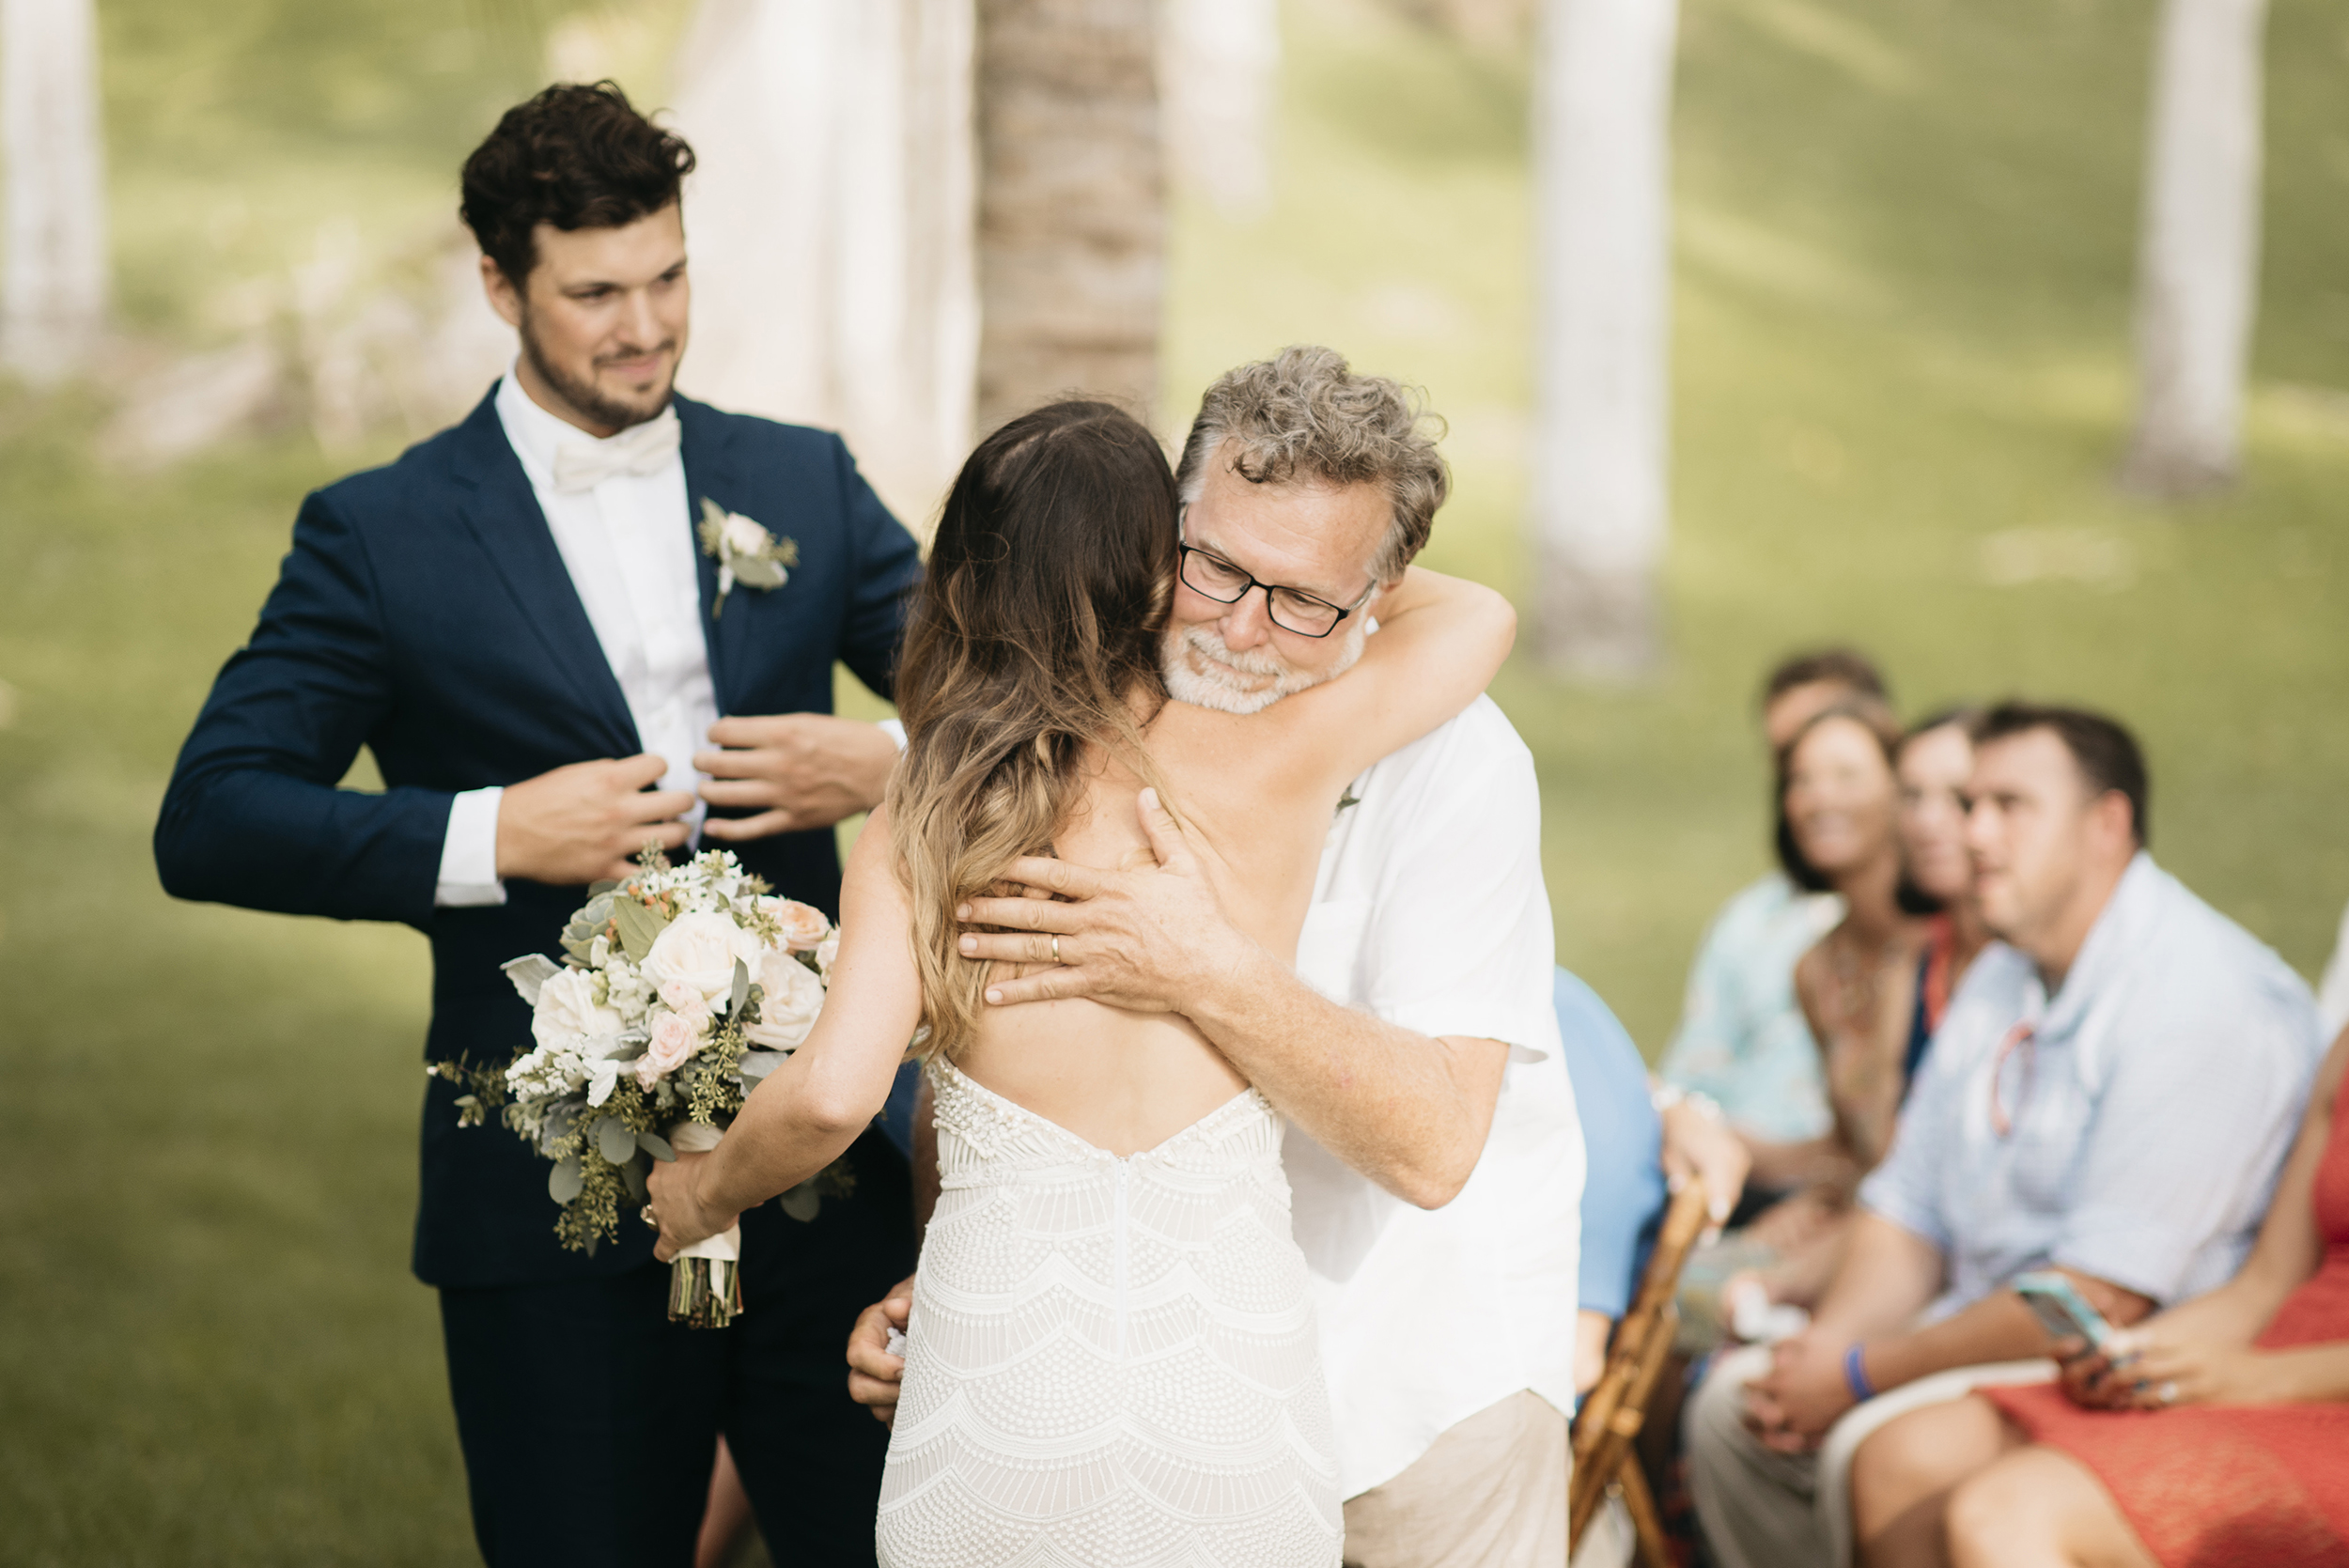 Colby-and-Jess-Intimate-Destination-Wedding-Sayulita-Puerto-Vallarta-Mexico264.jpg